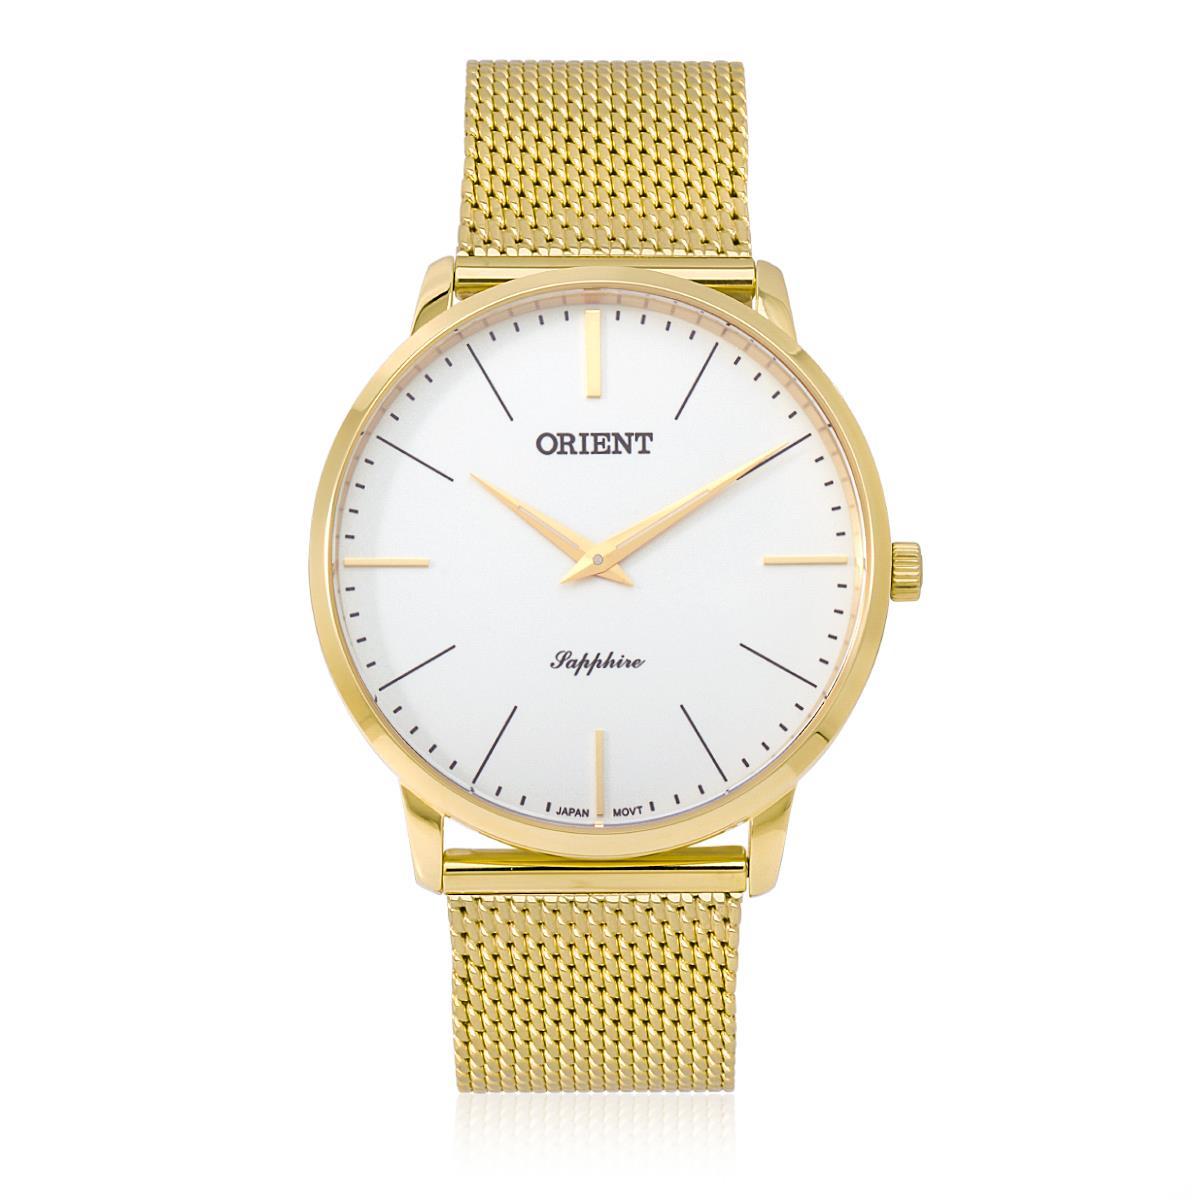 755a7a95b0a Relógio Orient Slim Sapphire